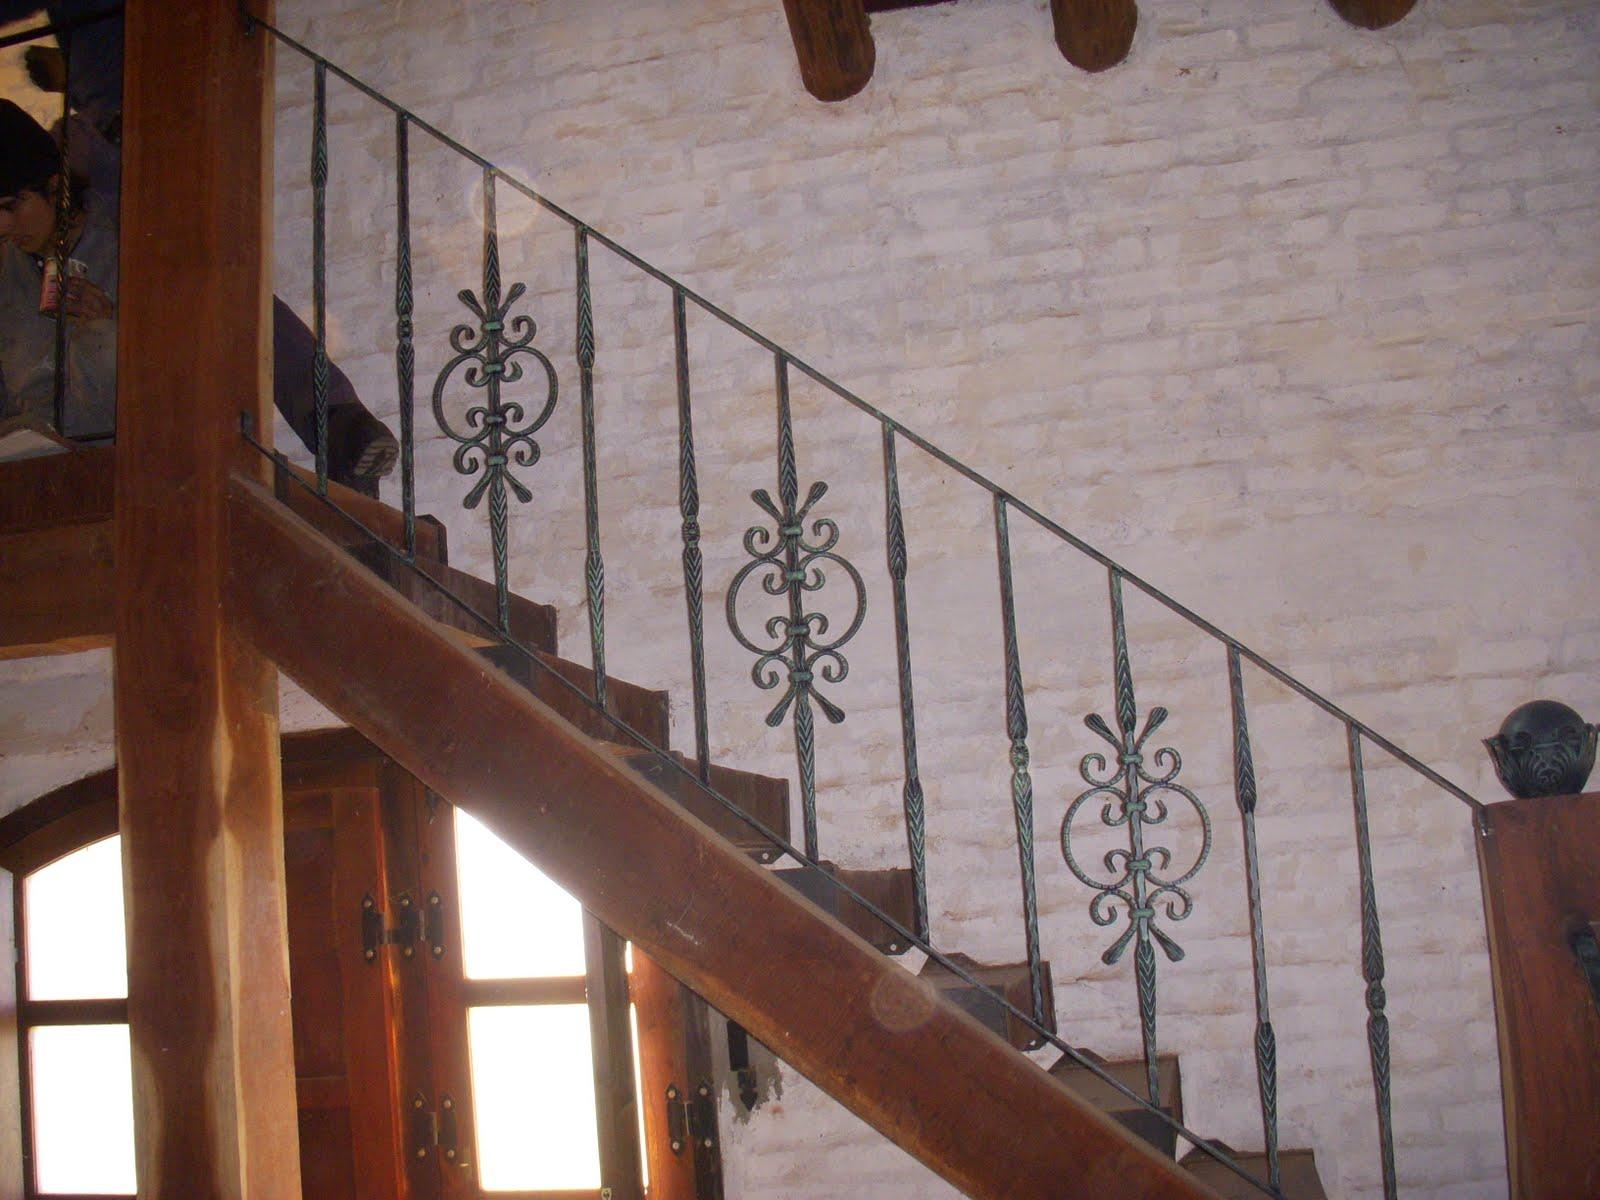 Forjados la farolera baranda de escalera de hierro forjado - Escaleras de hierro forjado ...